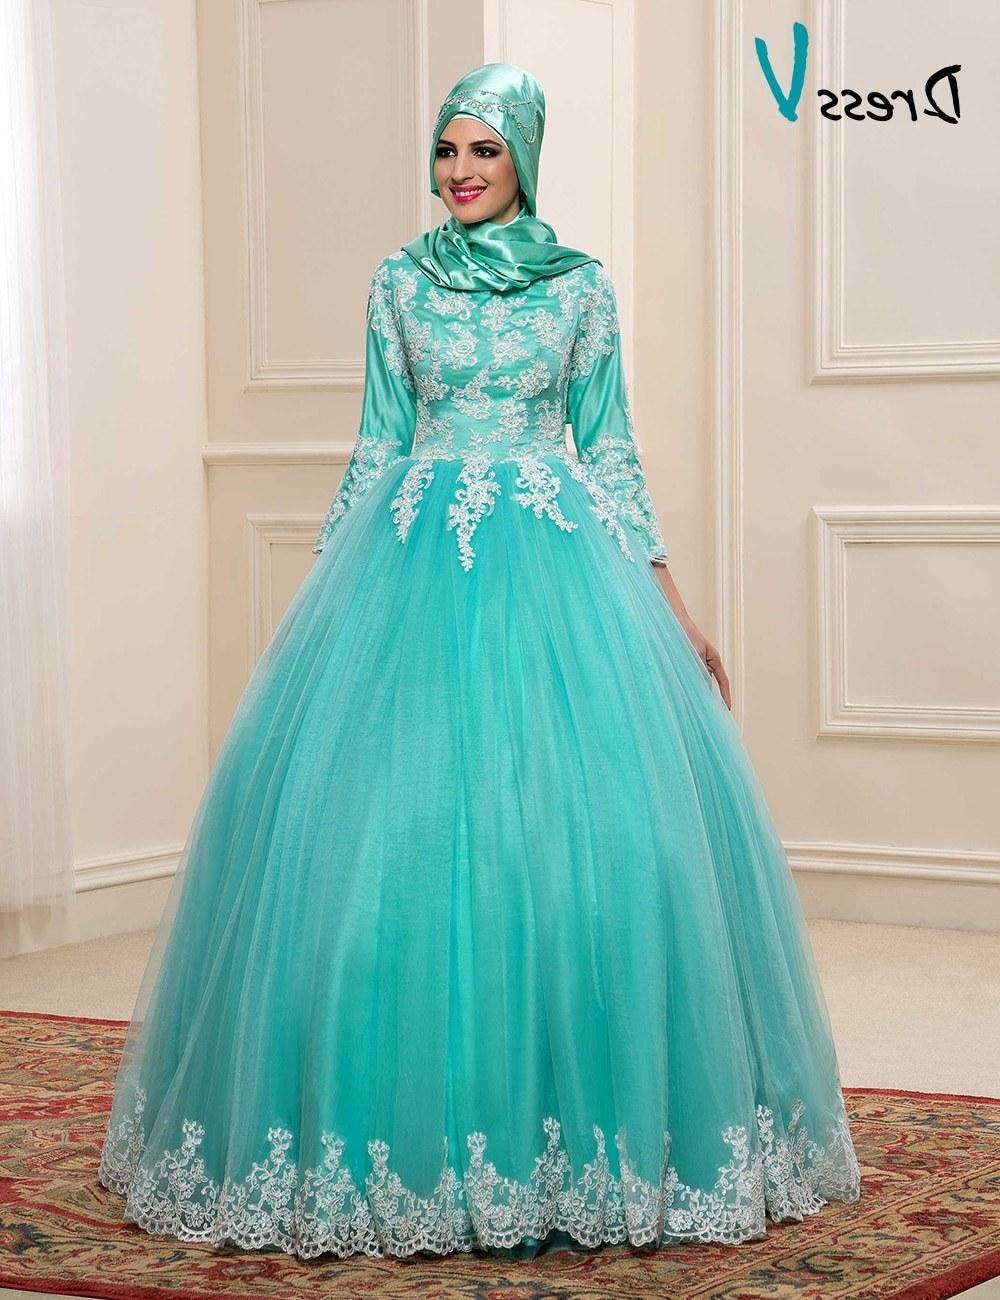 Design Gaun Pengantin 2016 Muslim Ipdd islamic Hijab Wedding Dresses – Fashion Dresses